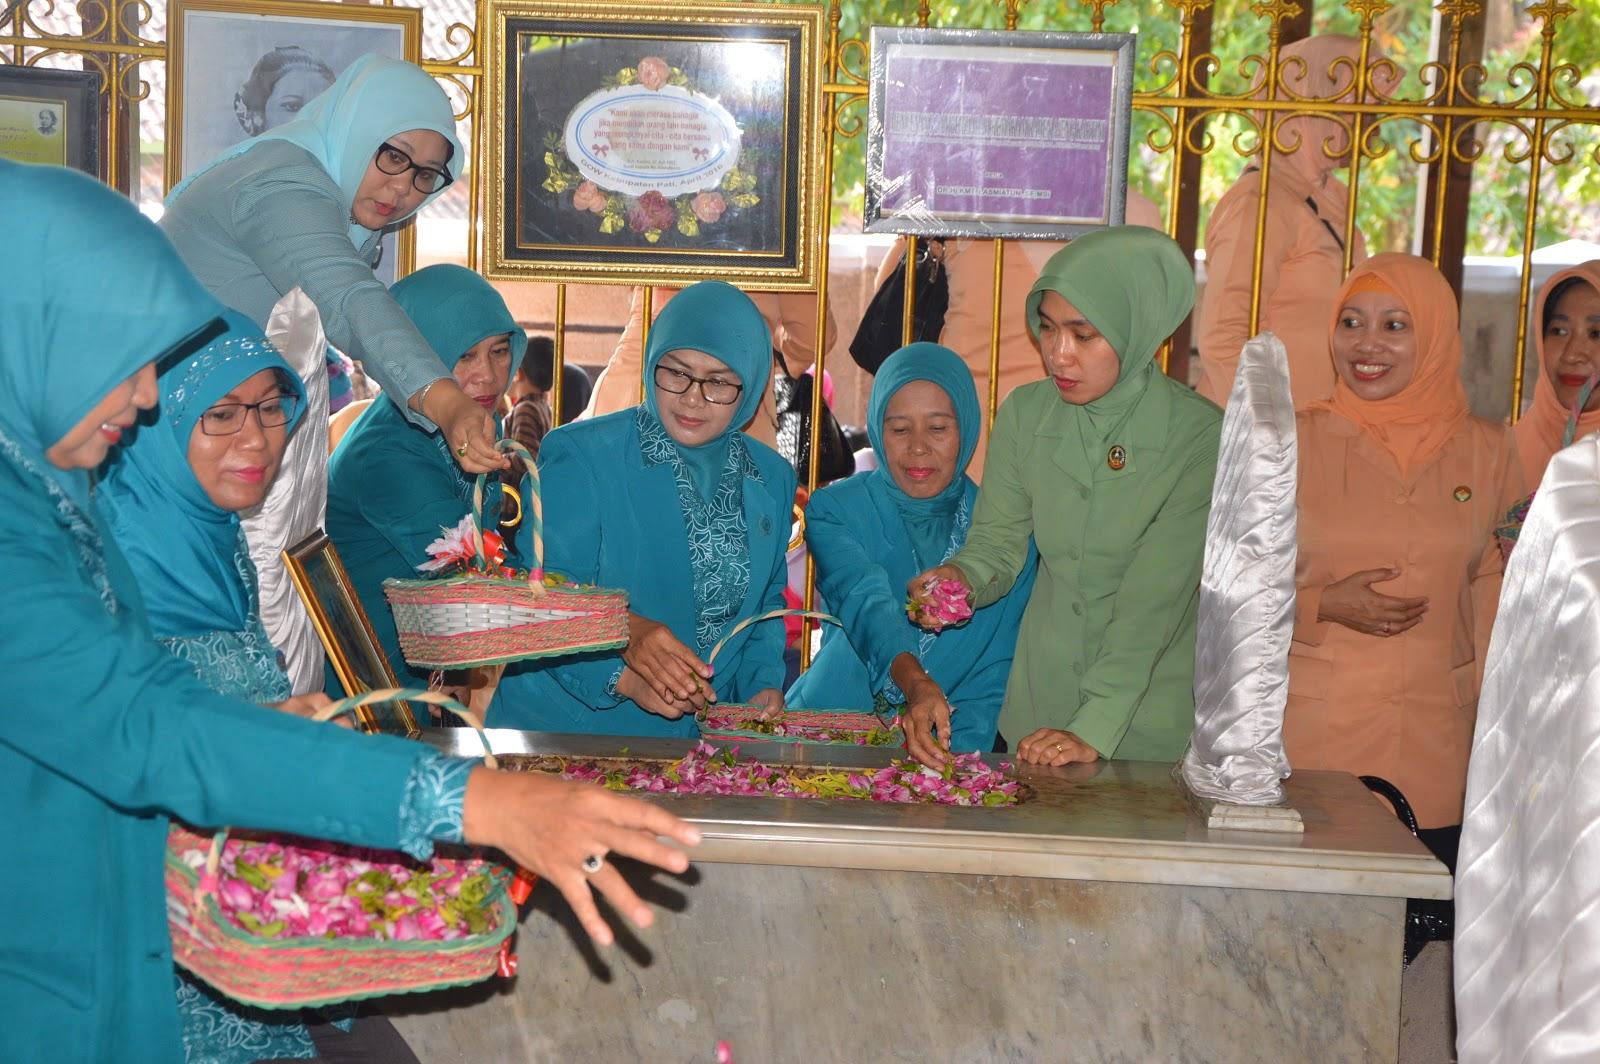 Gow Kabupaten Blora Gelar Ziarah Makam Ra Kartini Infoblora Gabungan